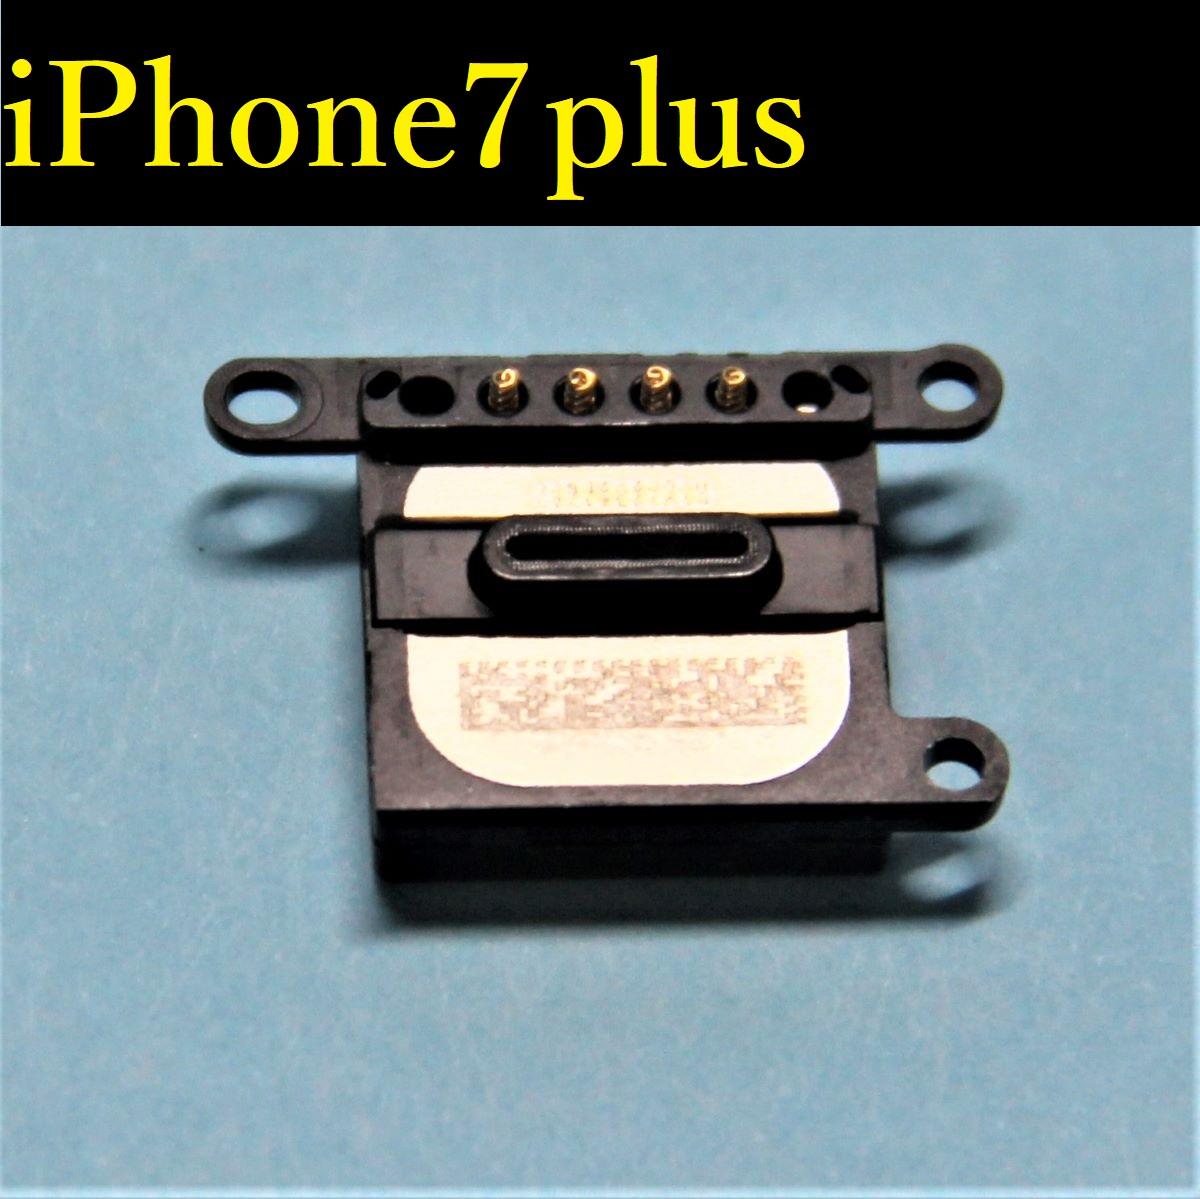 iPhone7plusイヤースピーカー 修理工具セット付き 5☆好評 修理交換パーツ クリアランスsale!期間限定! アイフォン リペア部品 上側スピーカーDIY修理